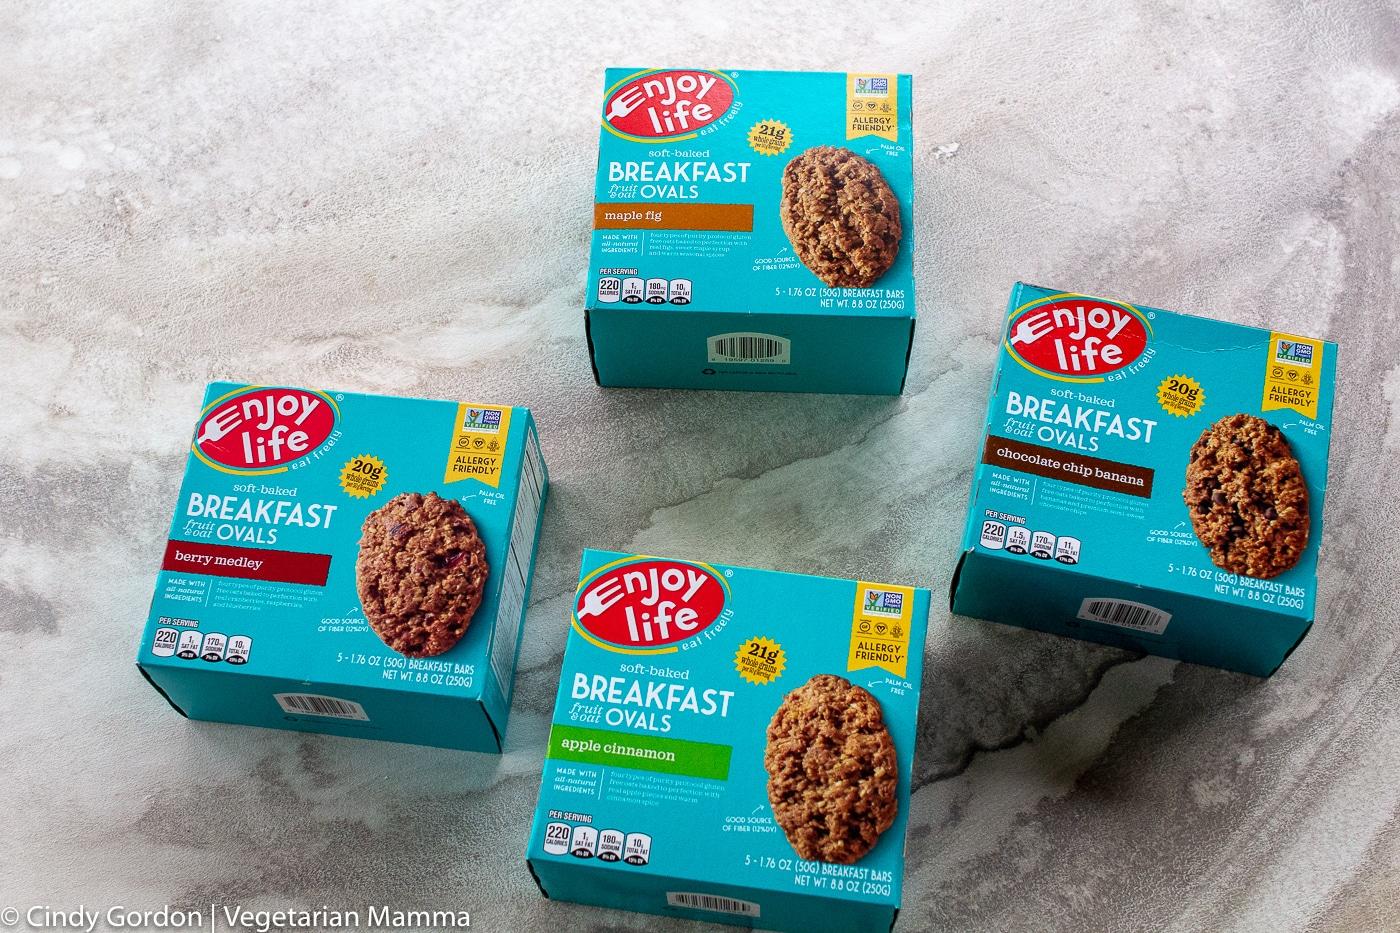 Enjoy Life Foods Breakfast oval review